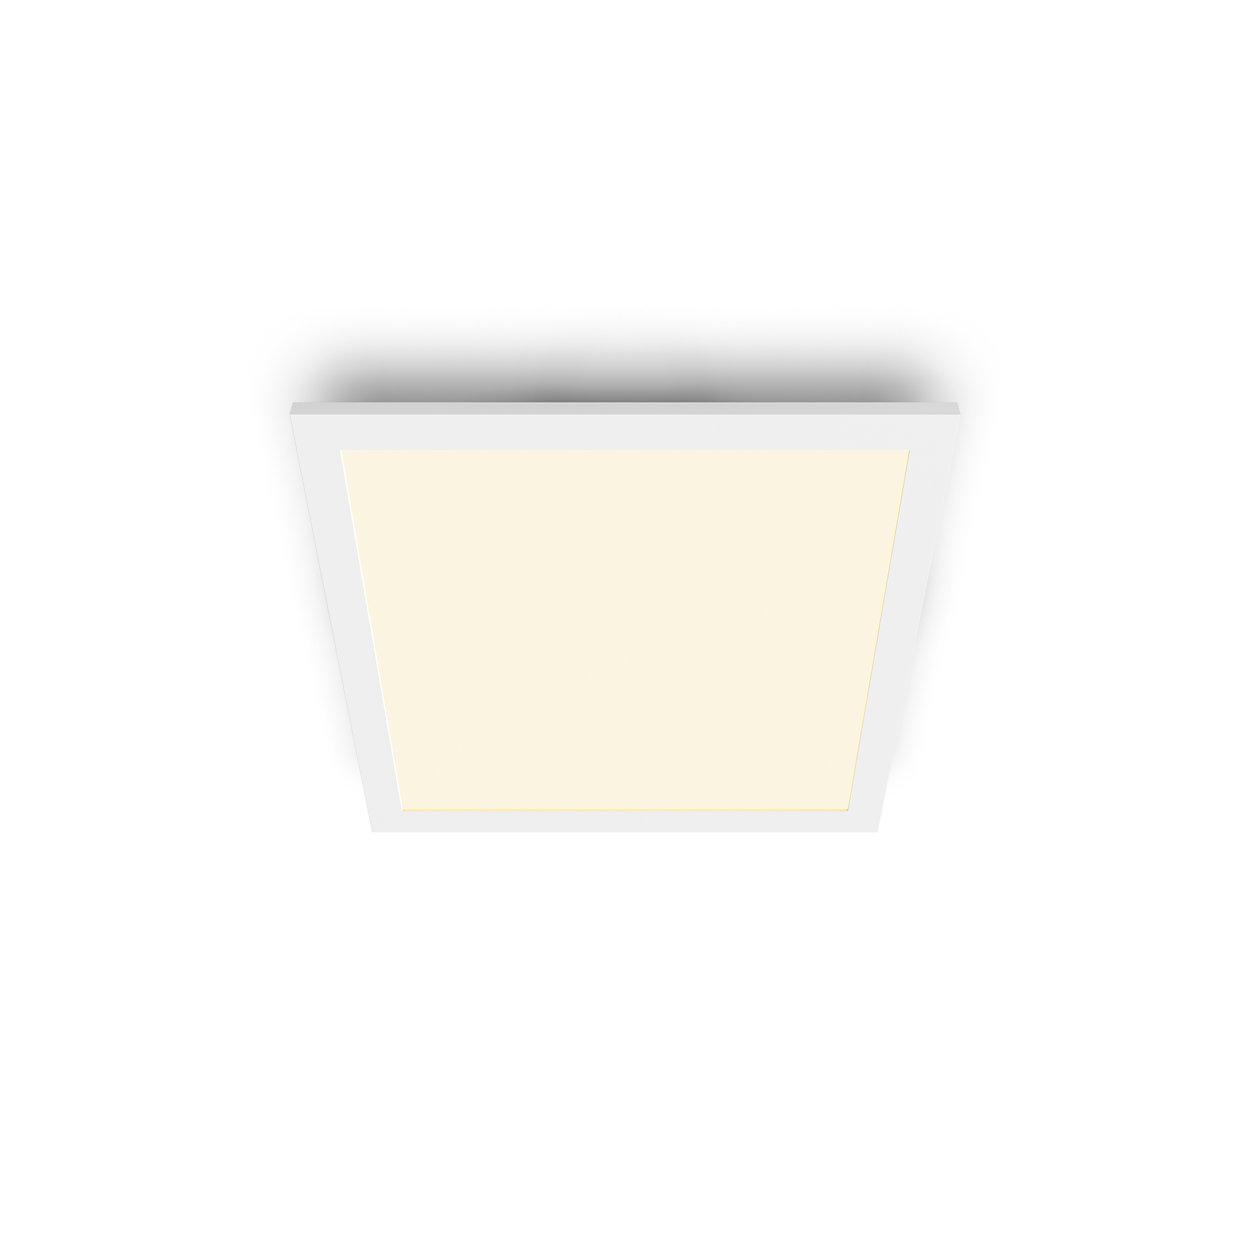 Panello LED regolabile senza un dimmer